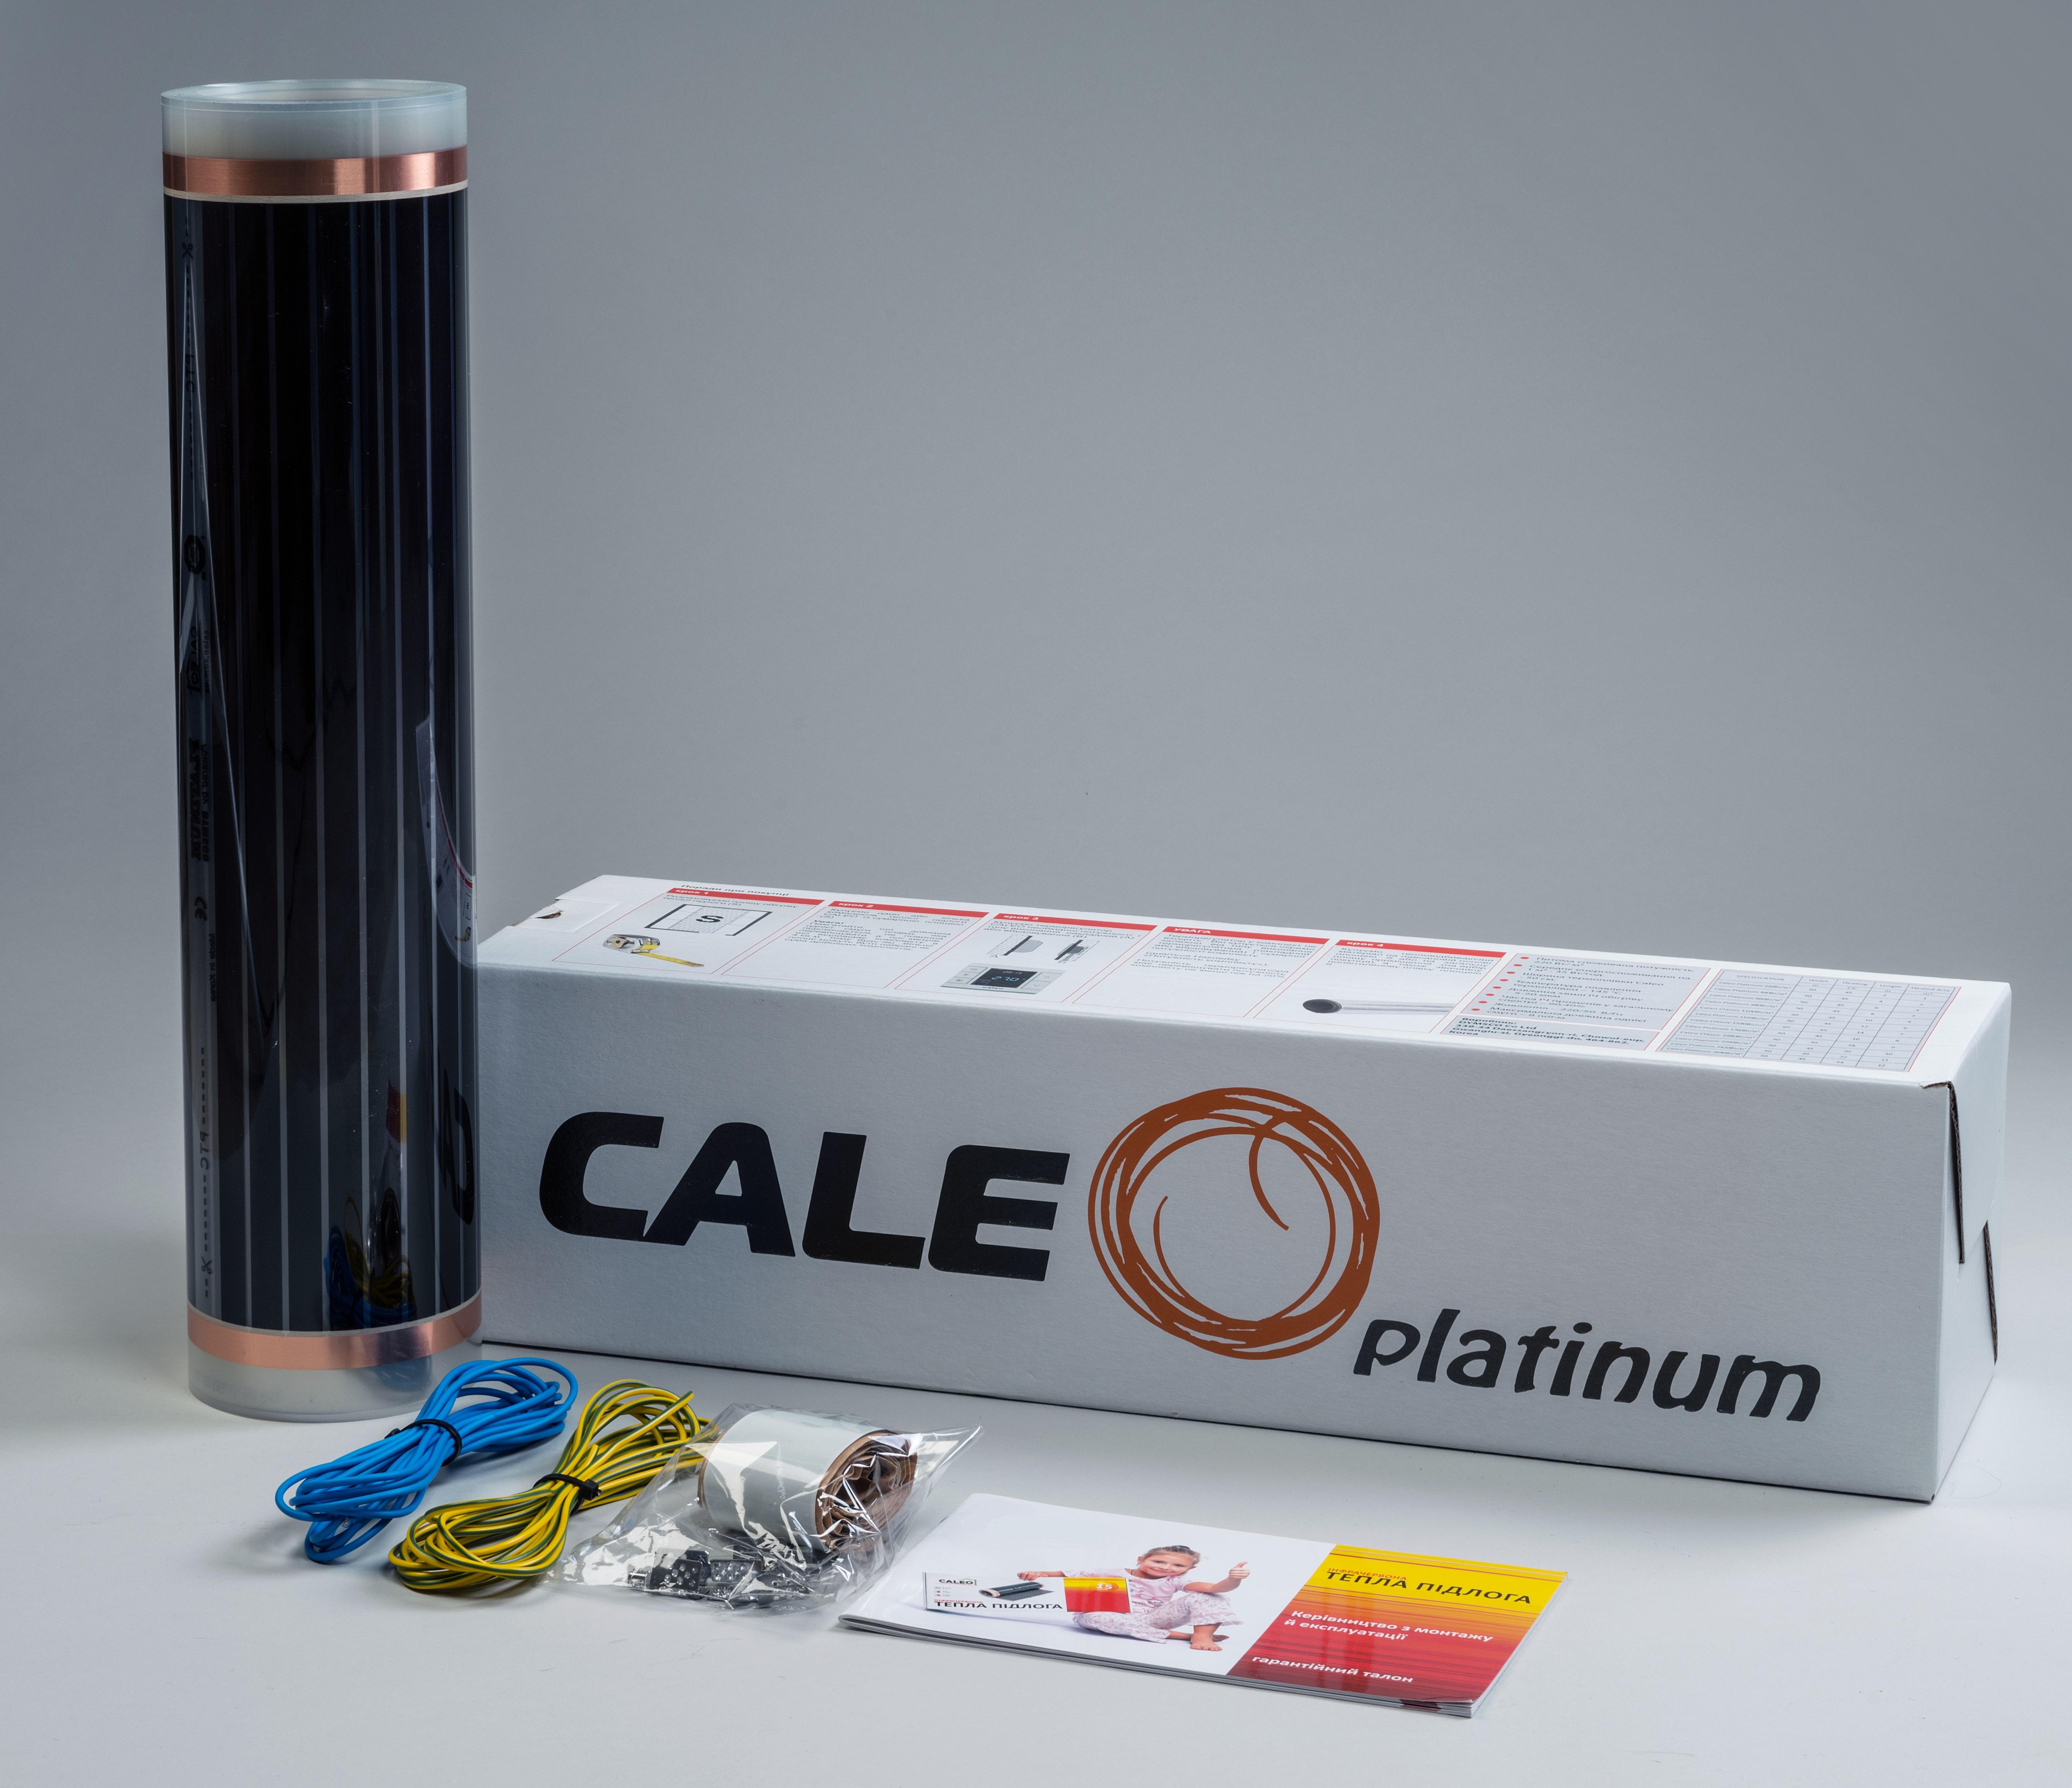 caleo (южная корея) Caleo Platinum 220-0,5-7.0 (7 м2)